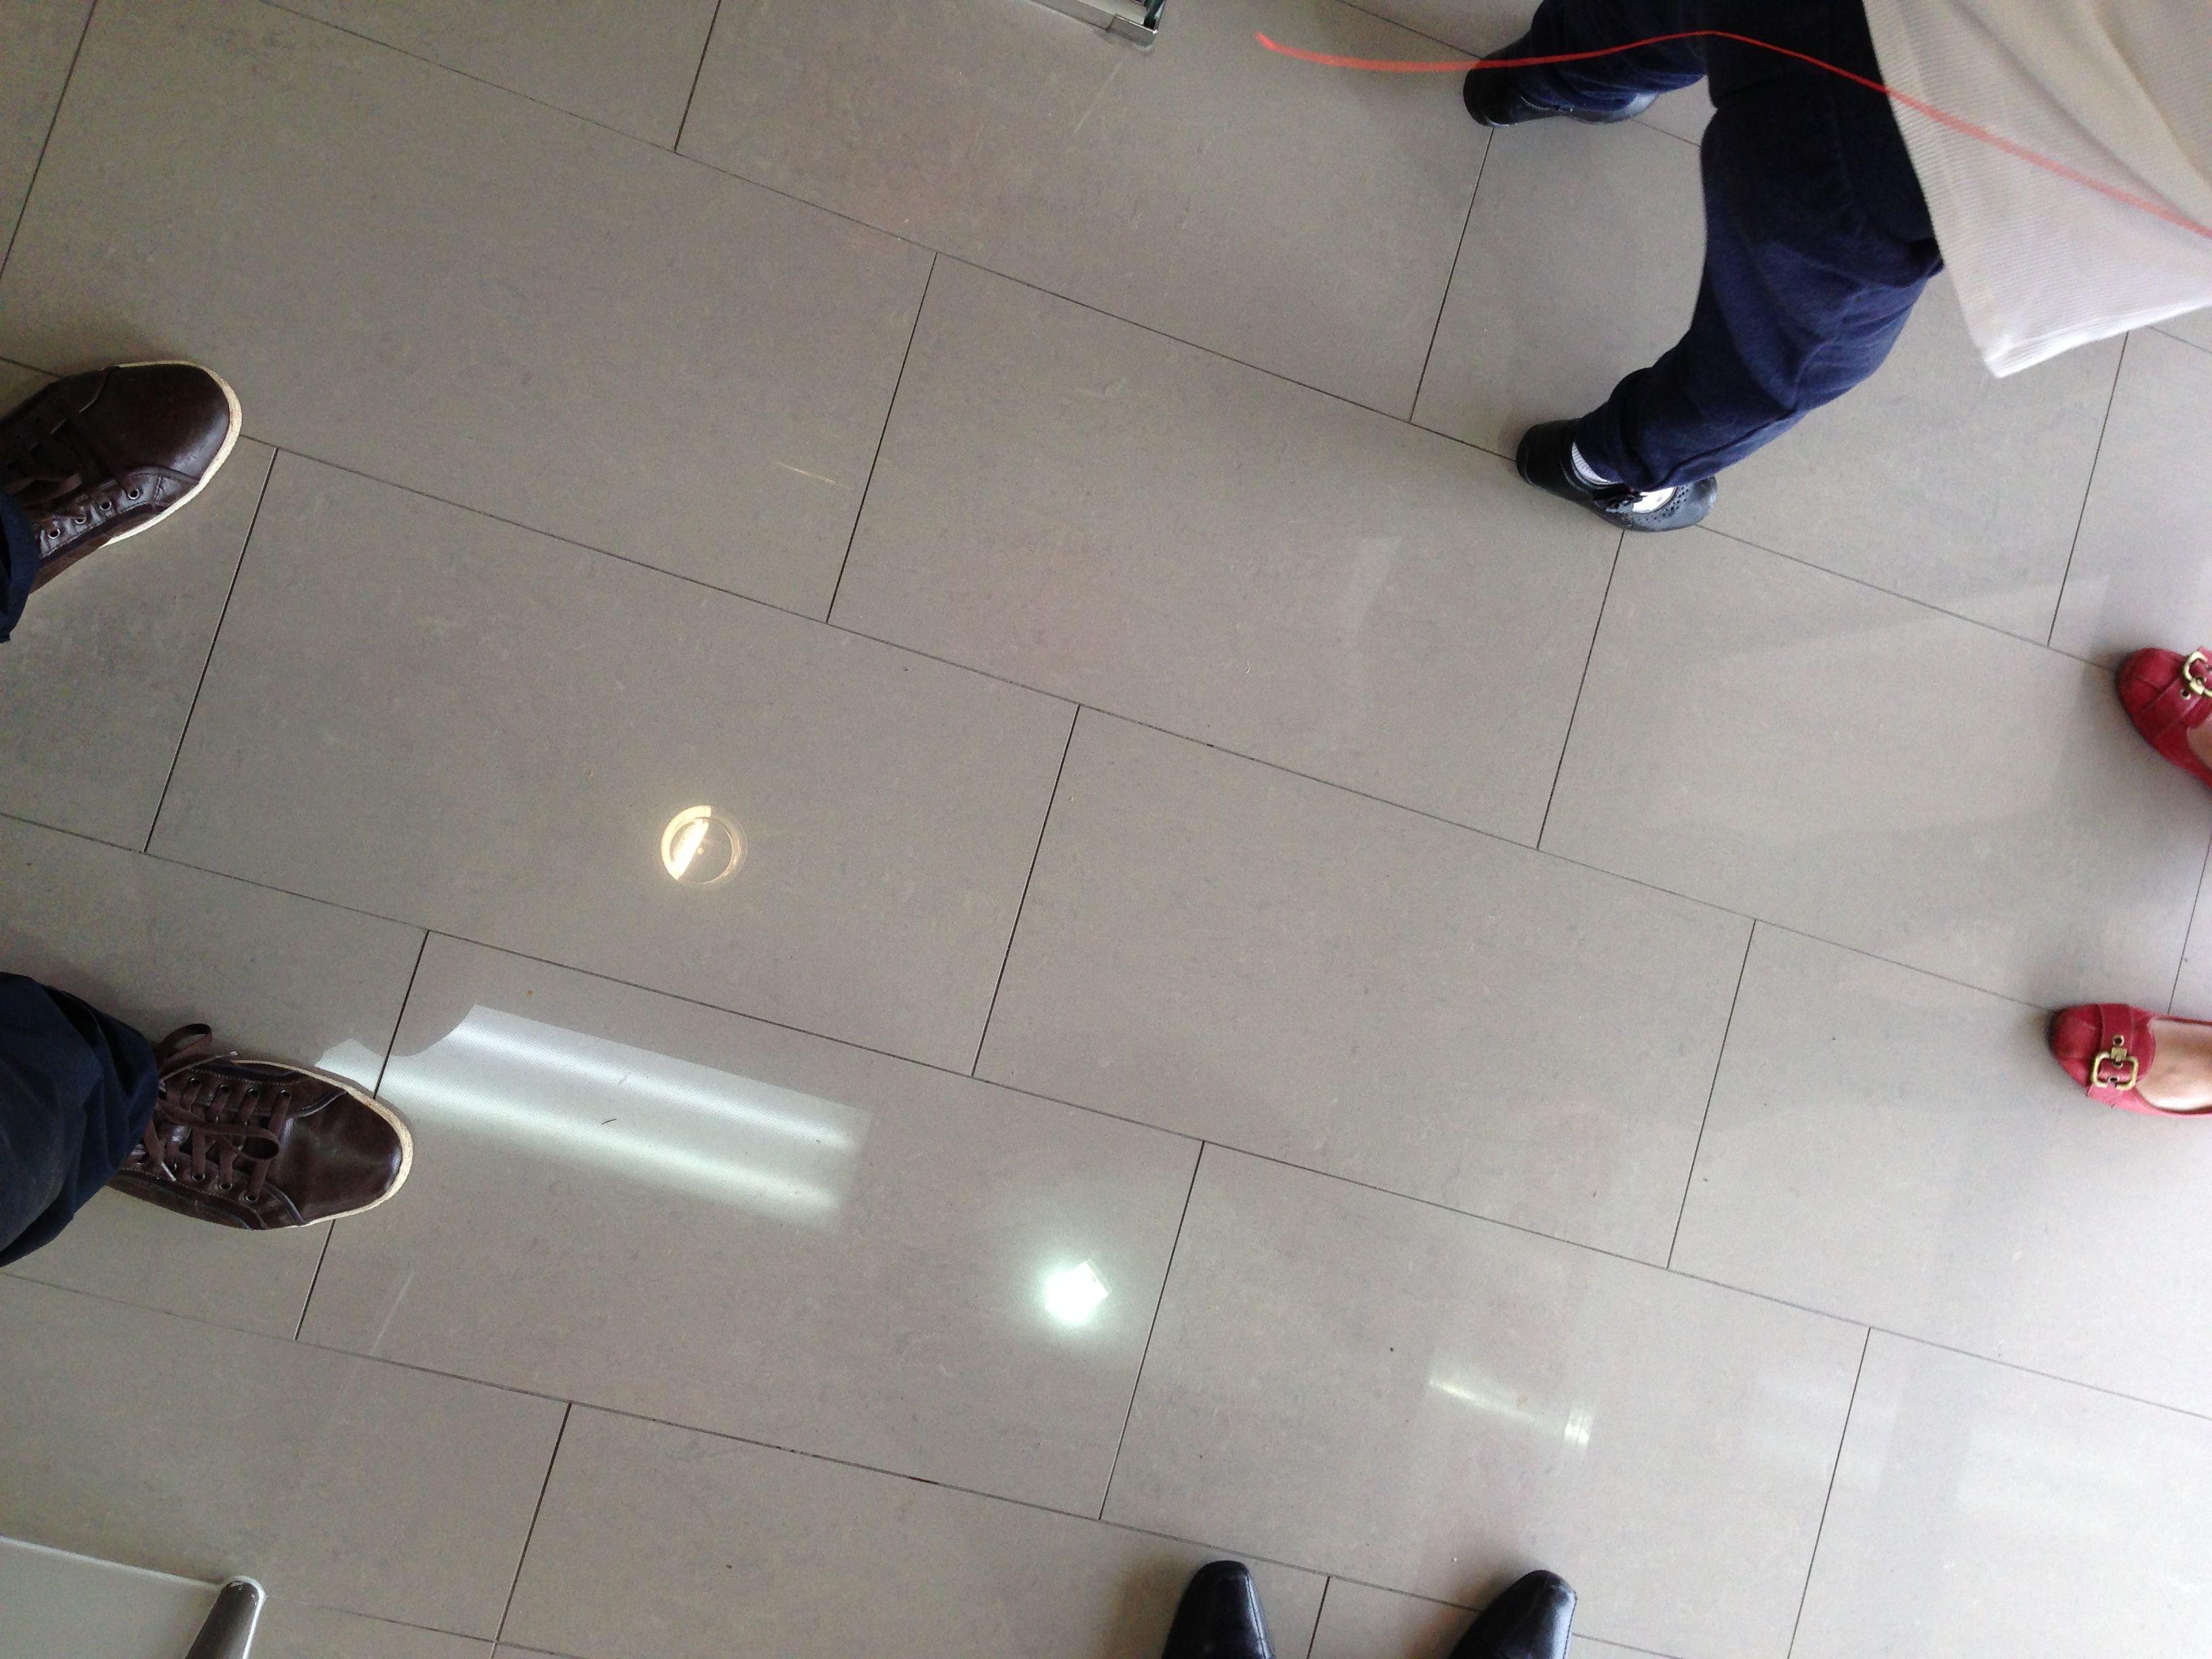 guest bathroom floor tiles preferred laying pattern amaya